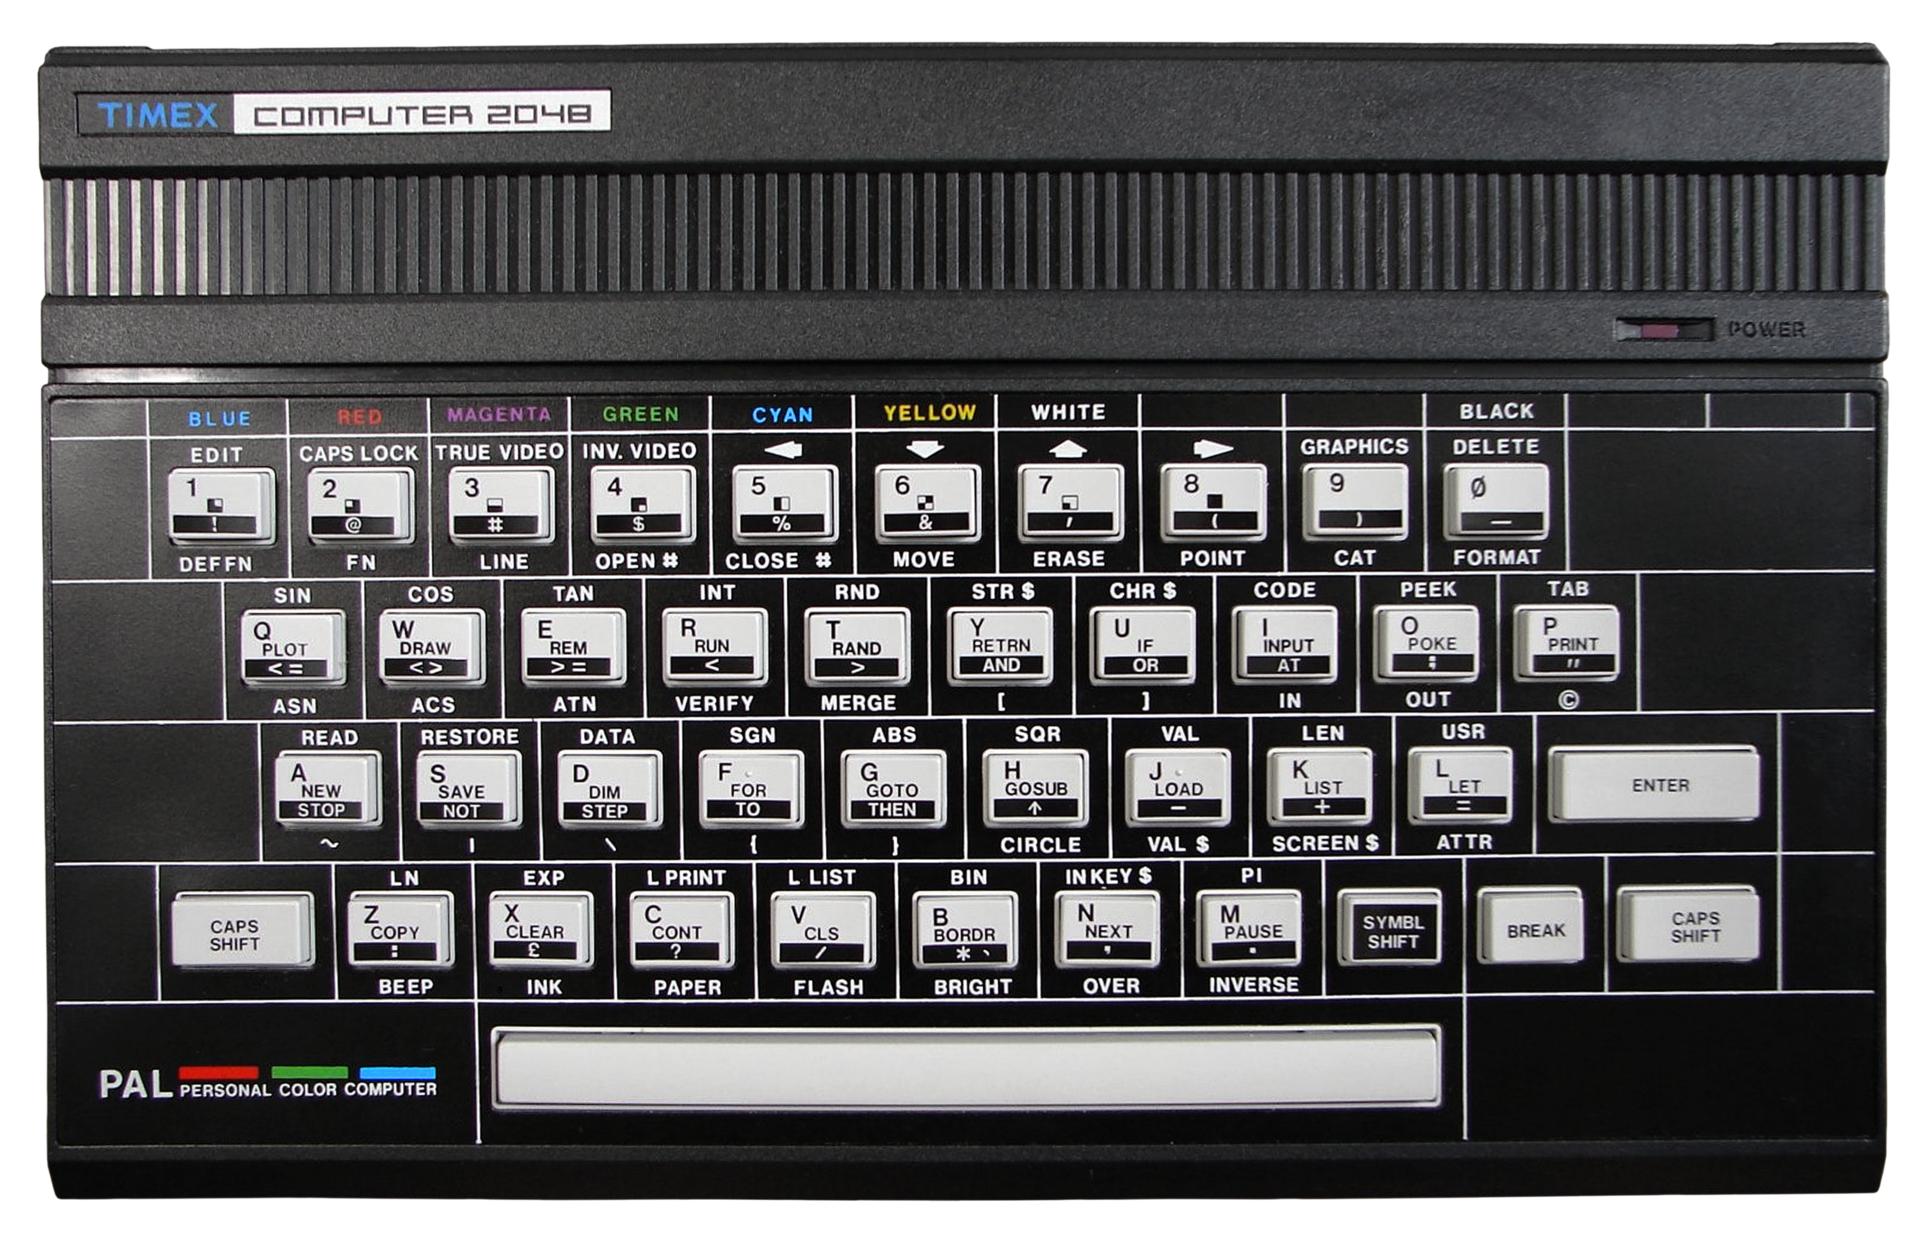 Timex Computer 2048